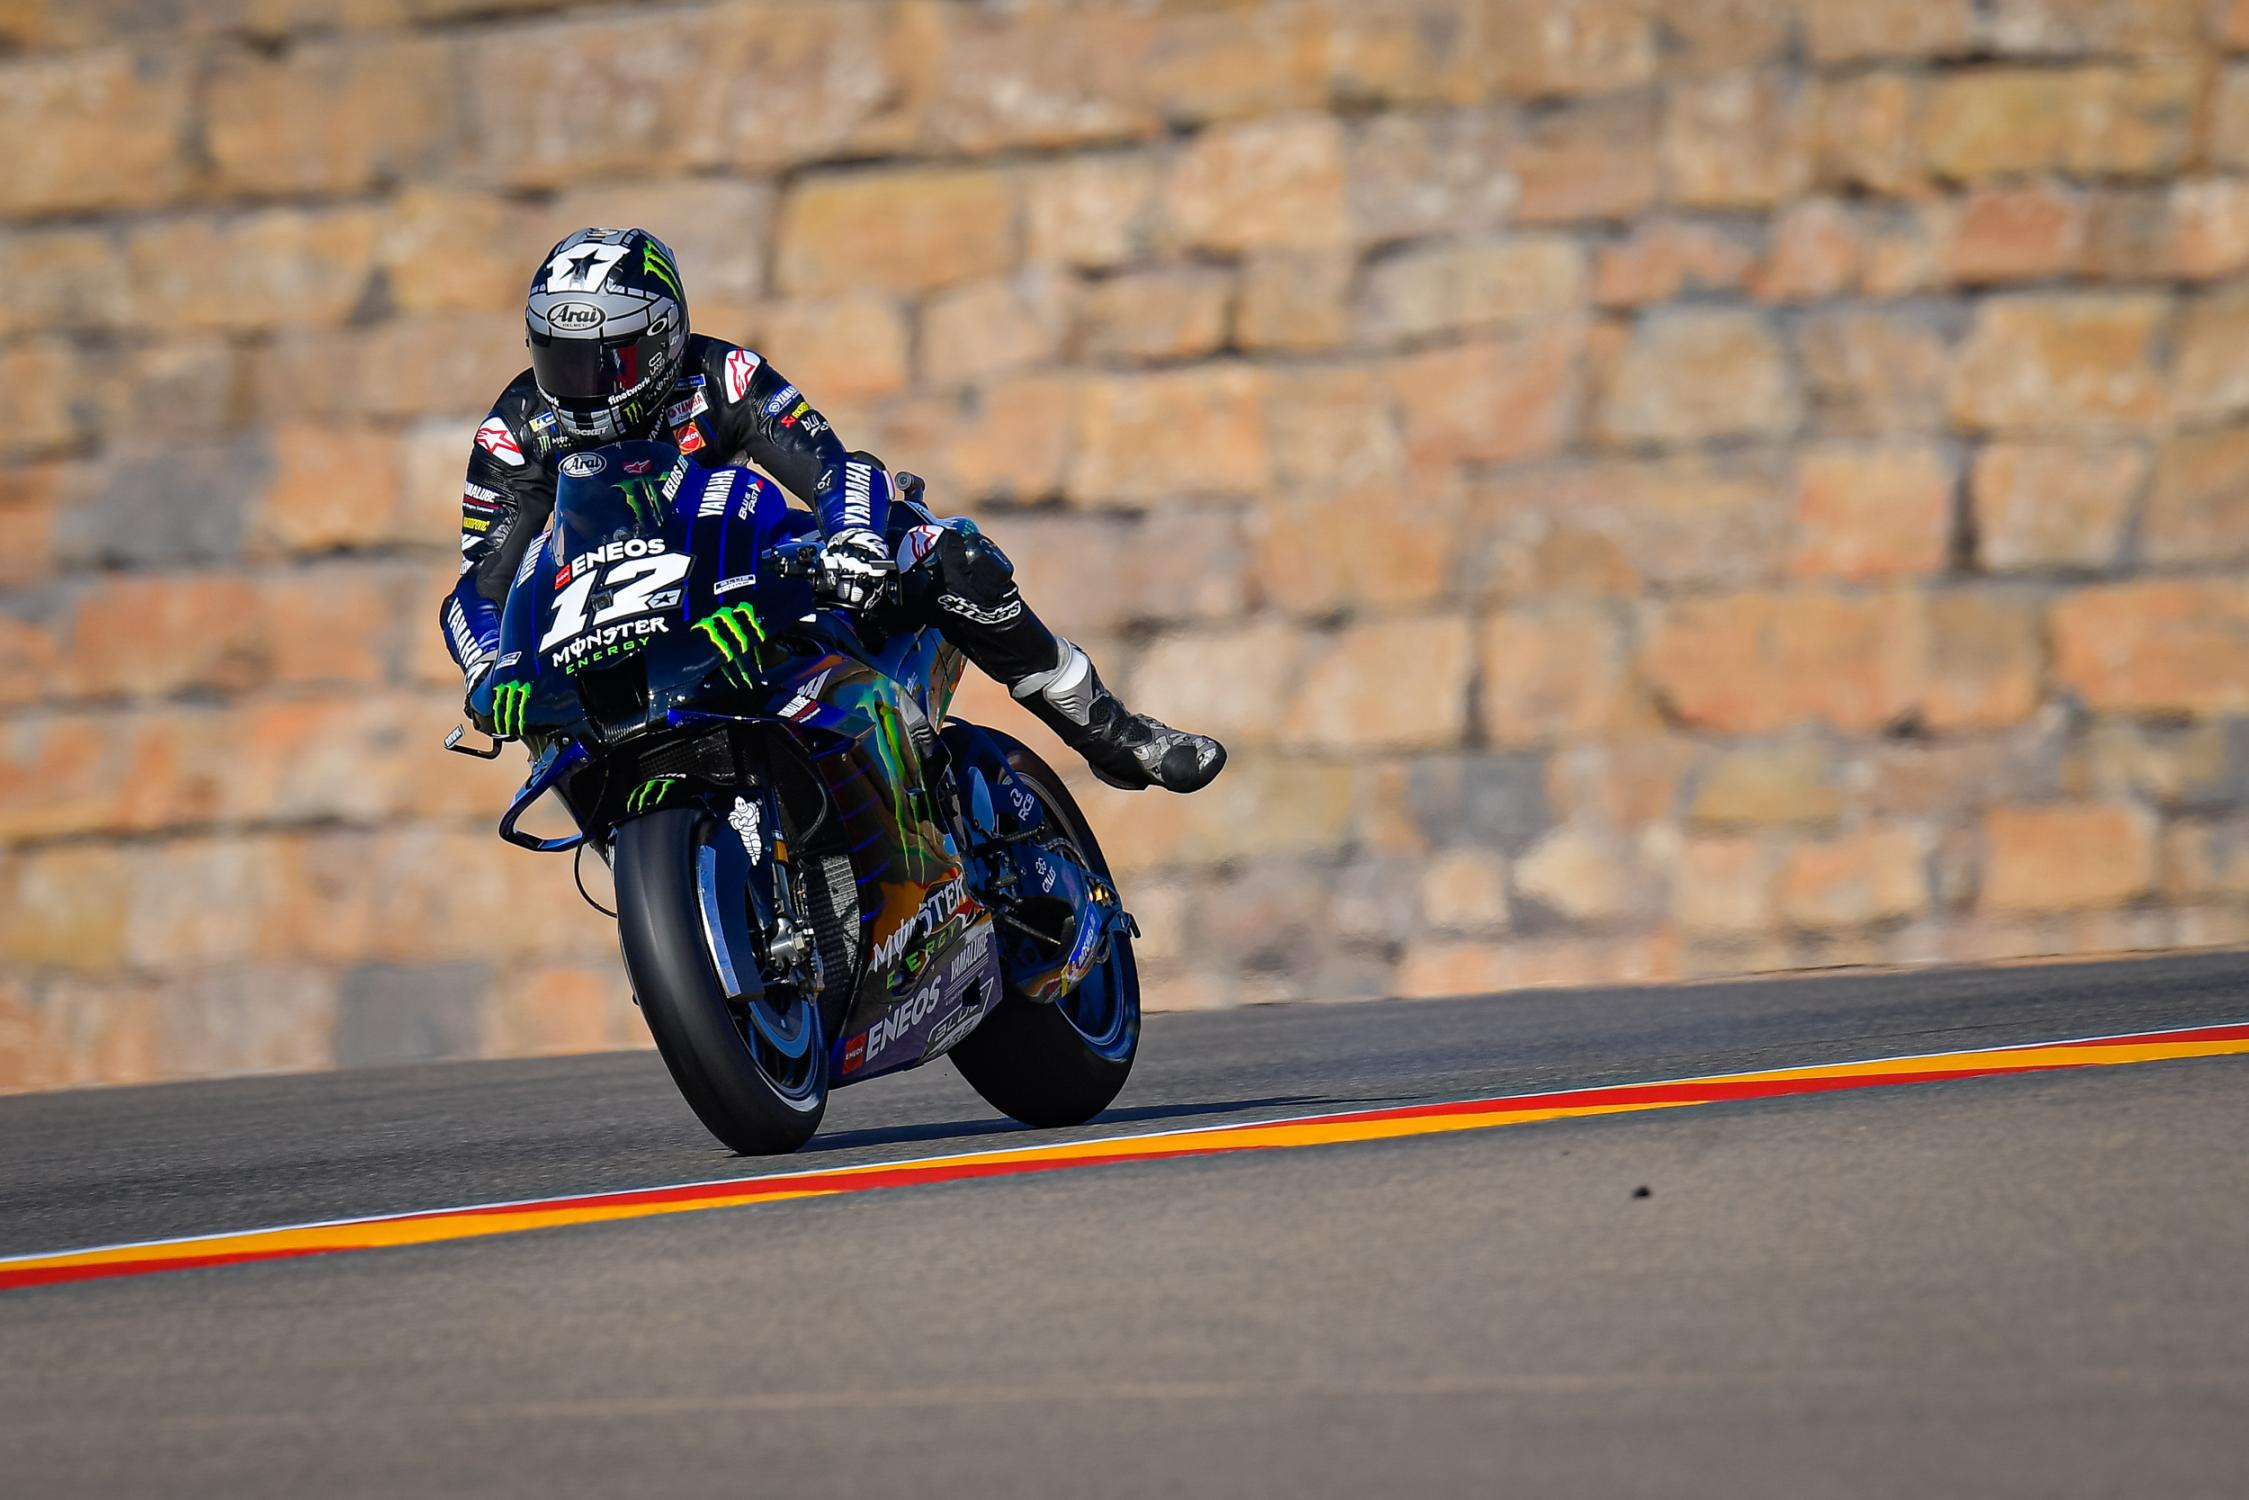 Maverick Viñales, Monster Energy Yamaha MotoGP, Motorland Aragon 2020